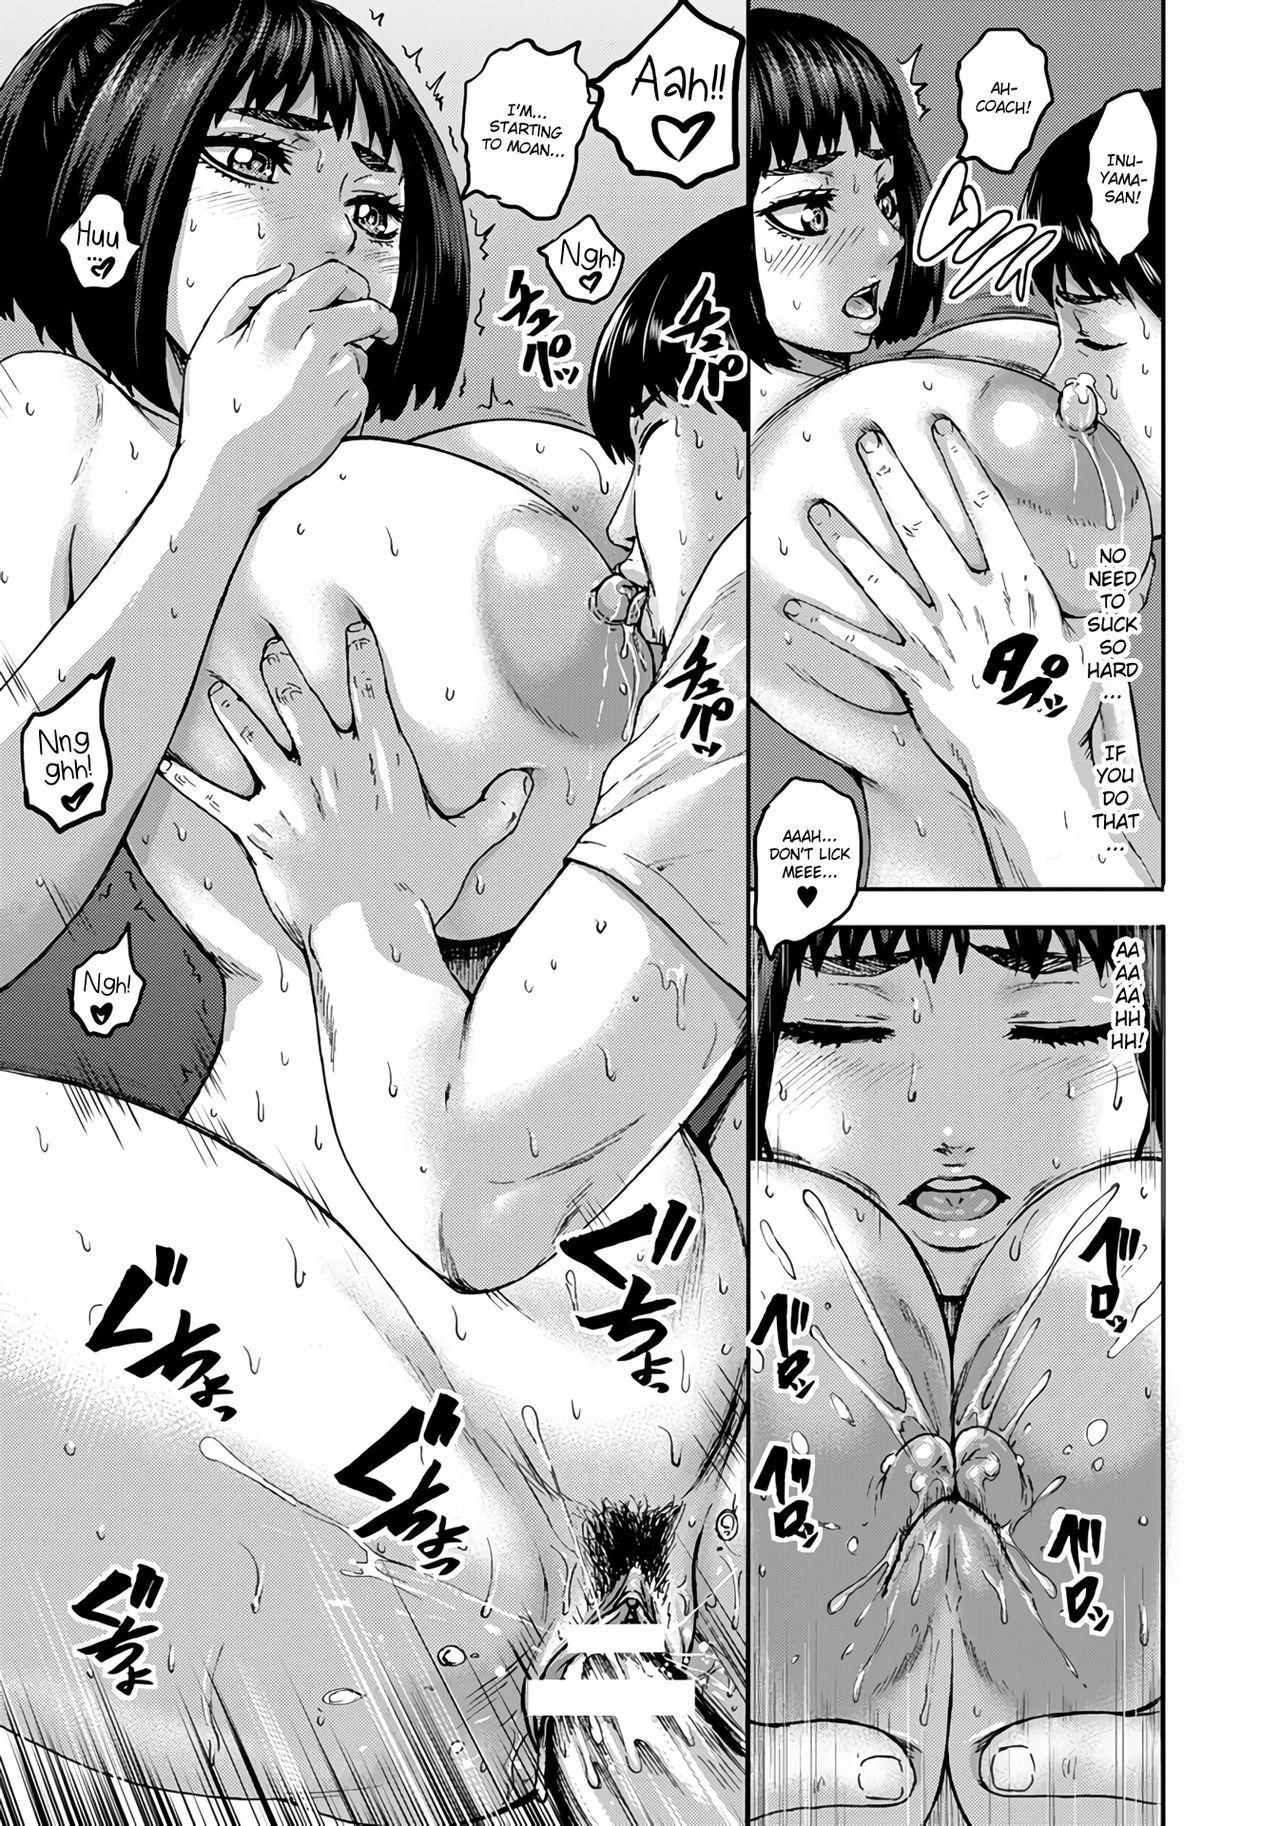 Chounyuu Gakuen | Academy For Huge Breasts 18